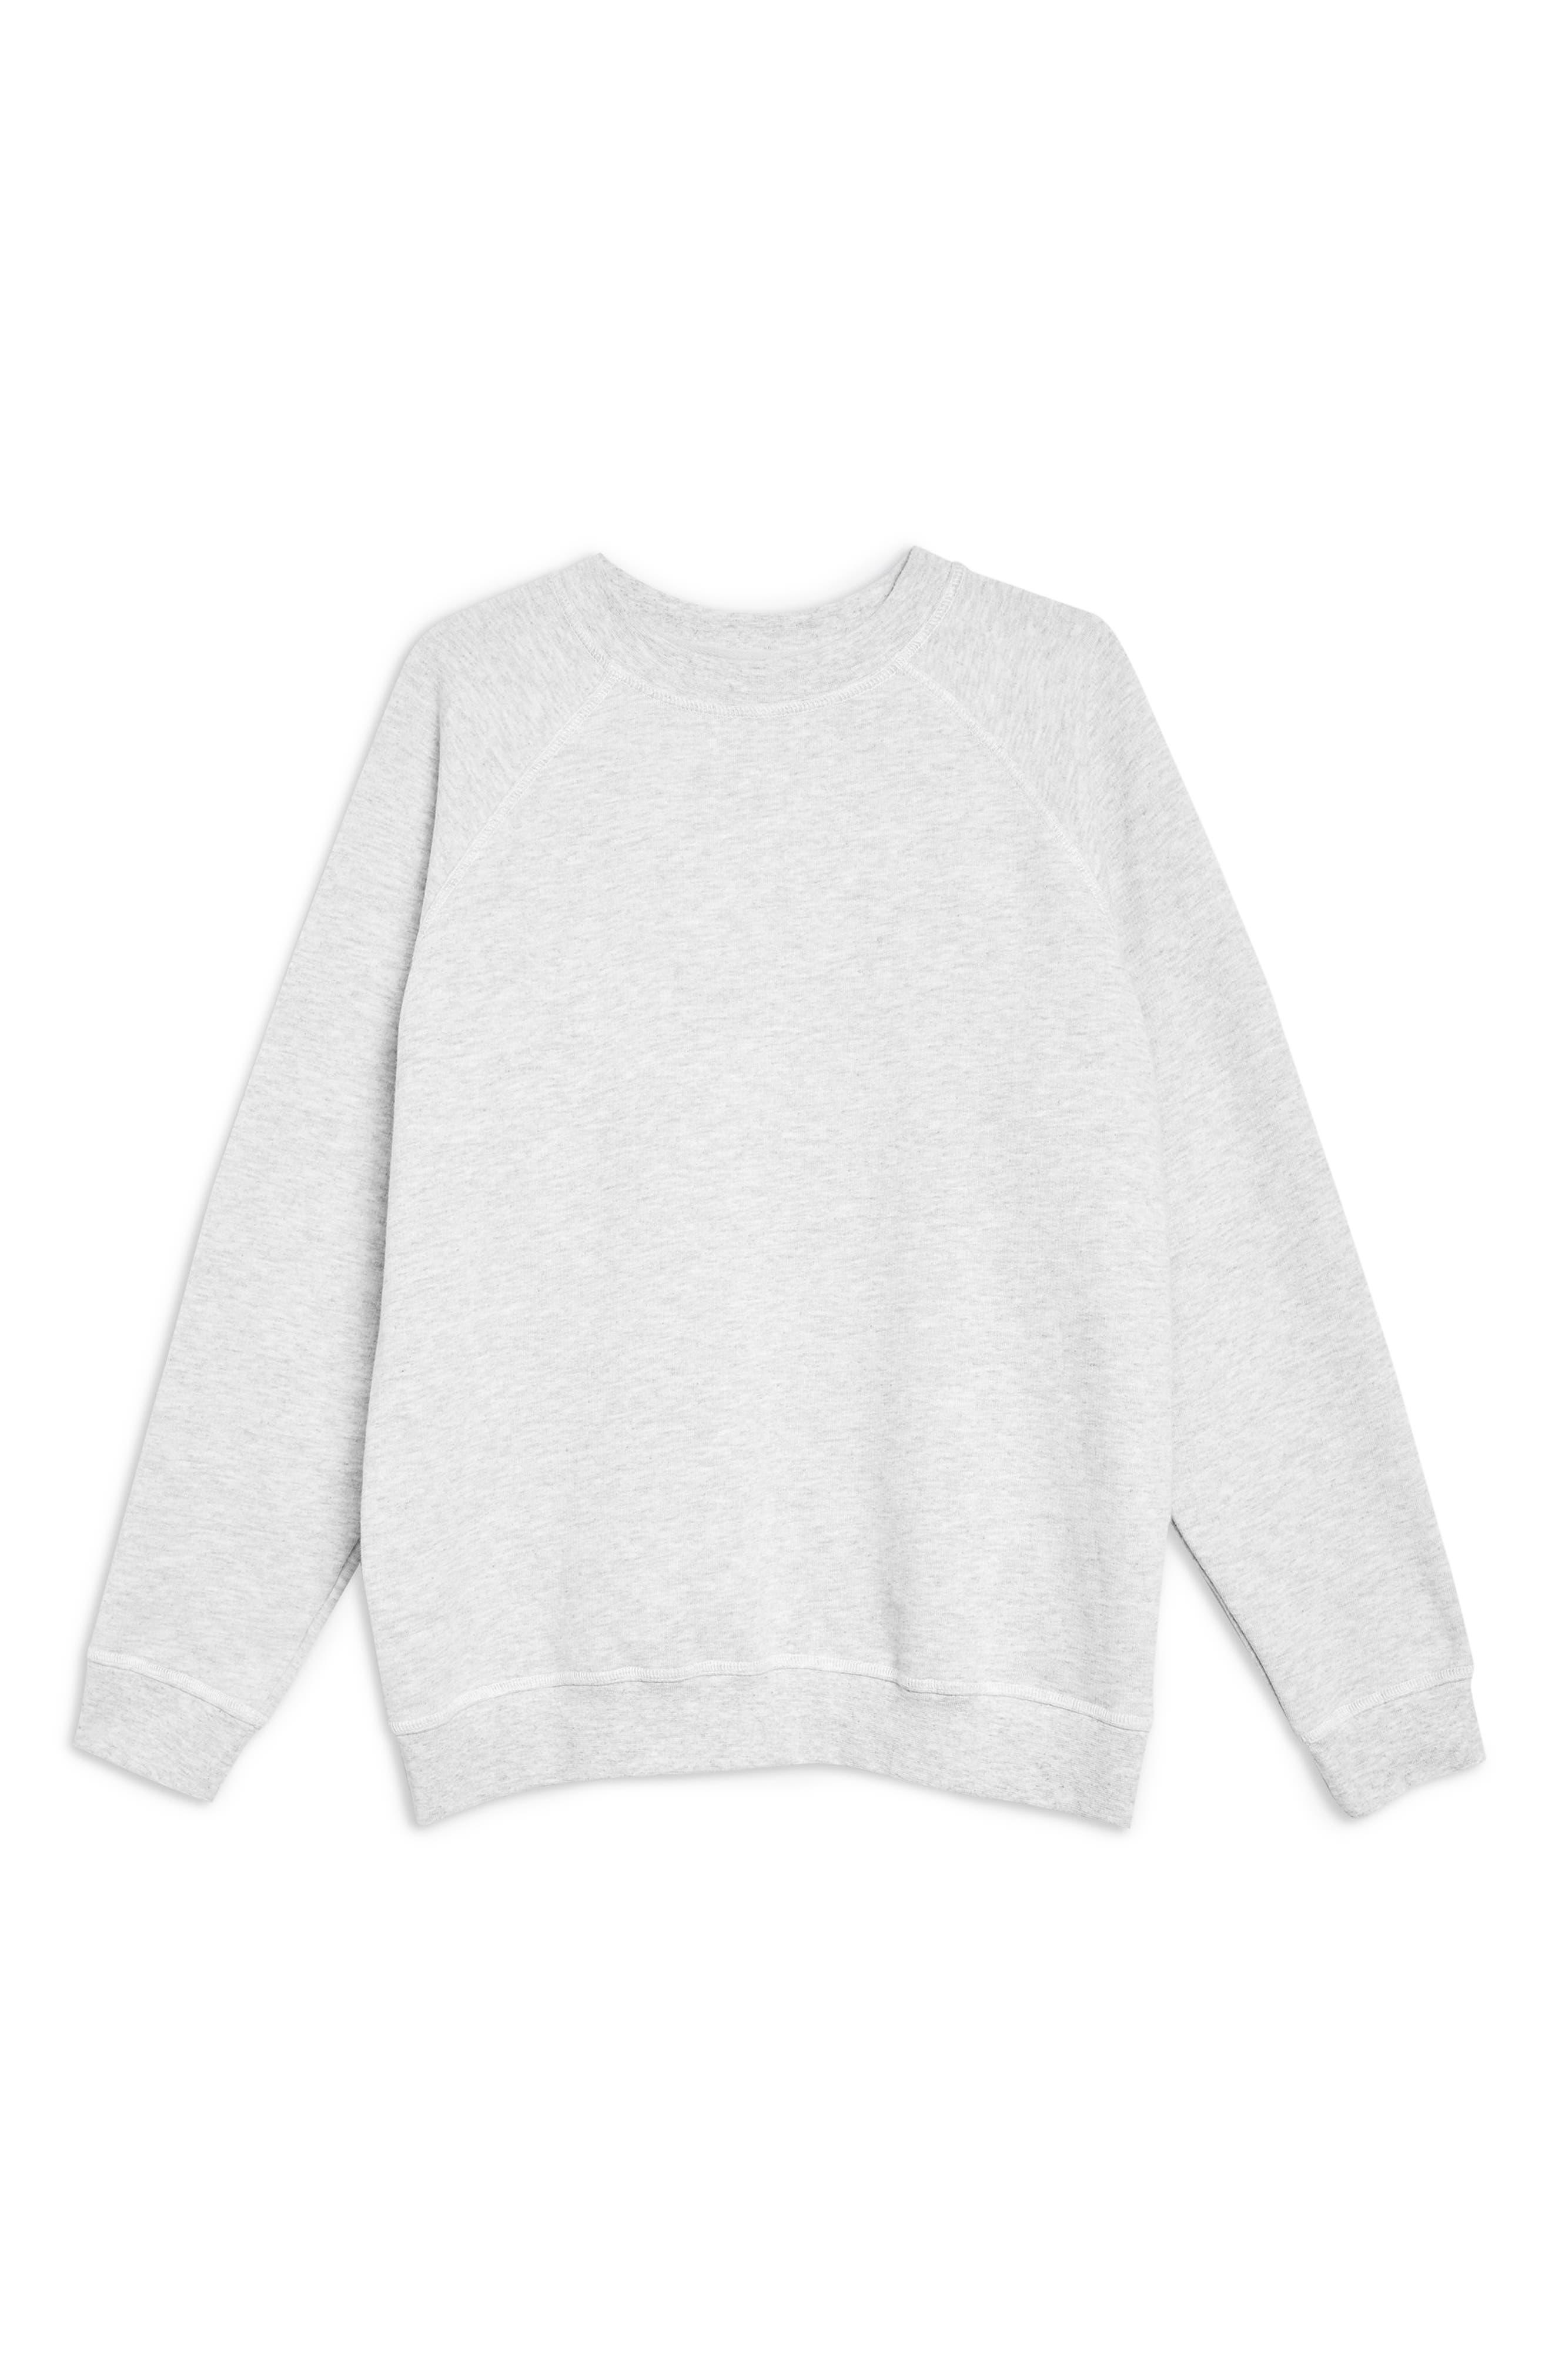 TOPSHOP, Crewneck Sweatshirt, Alternate thumbnail 4, color, 020